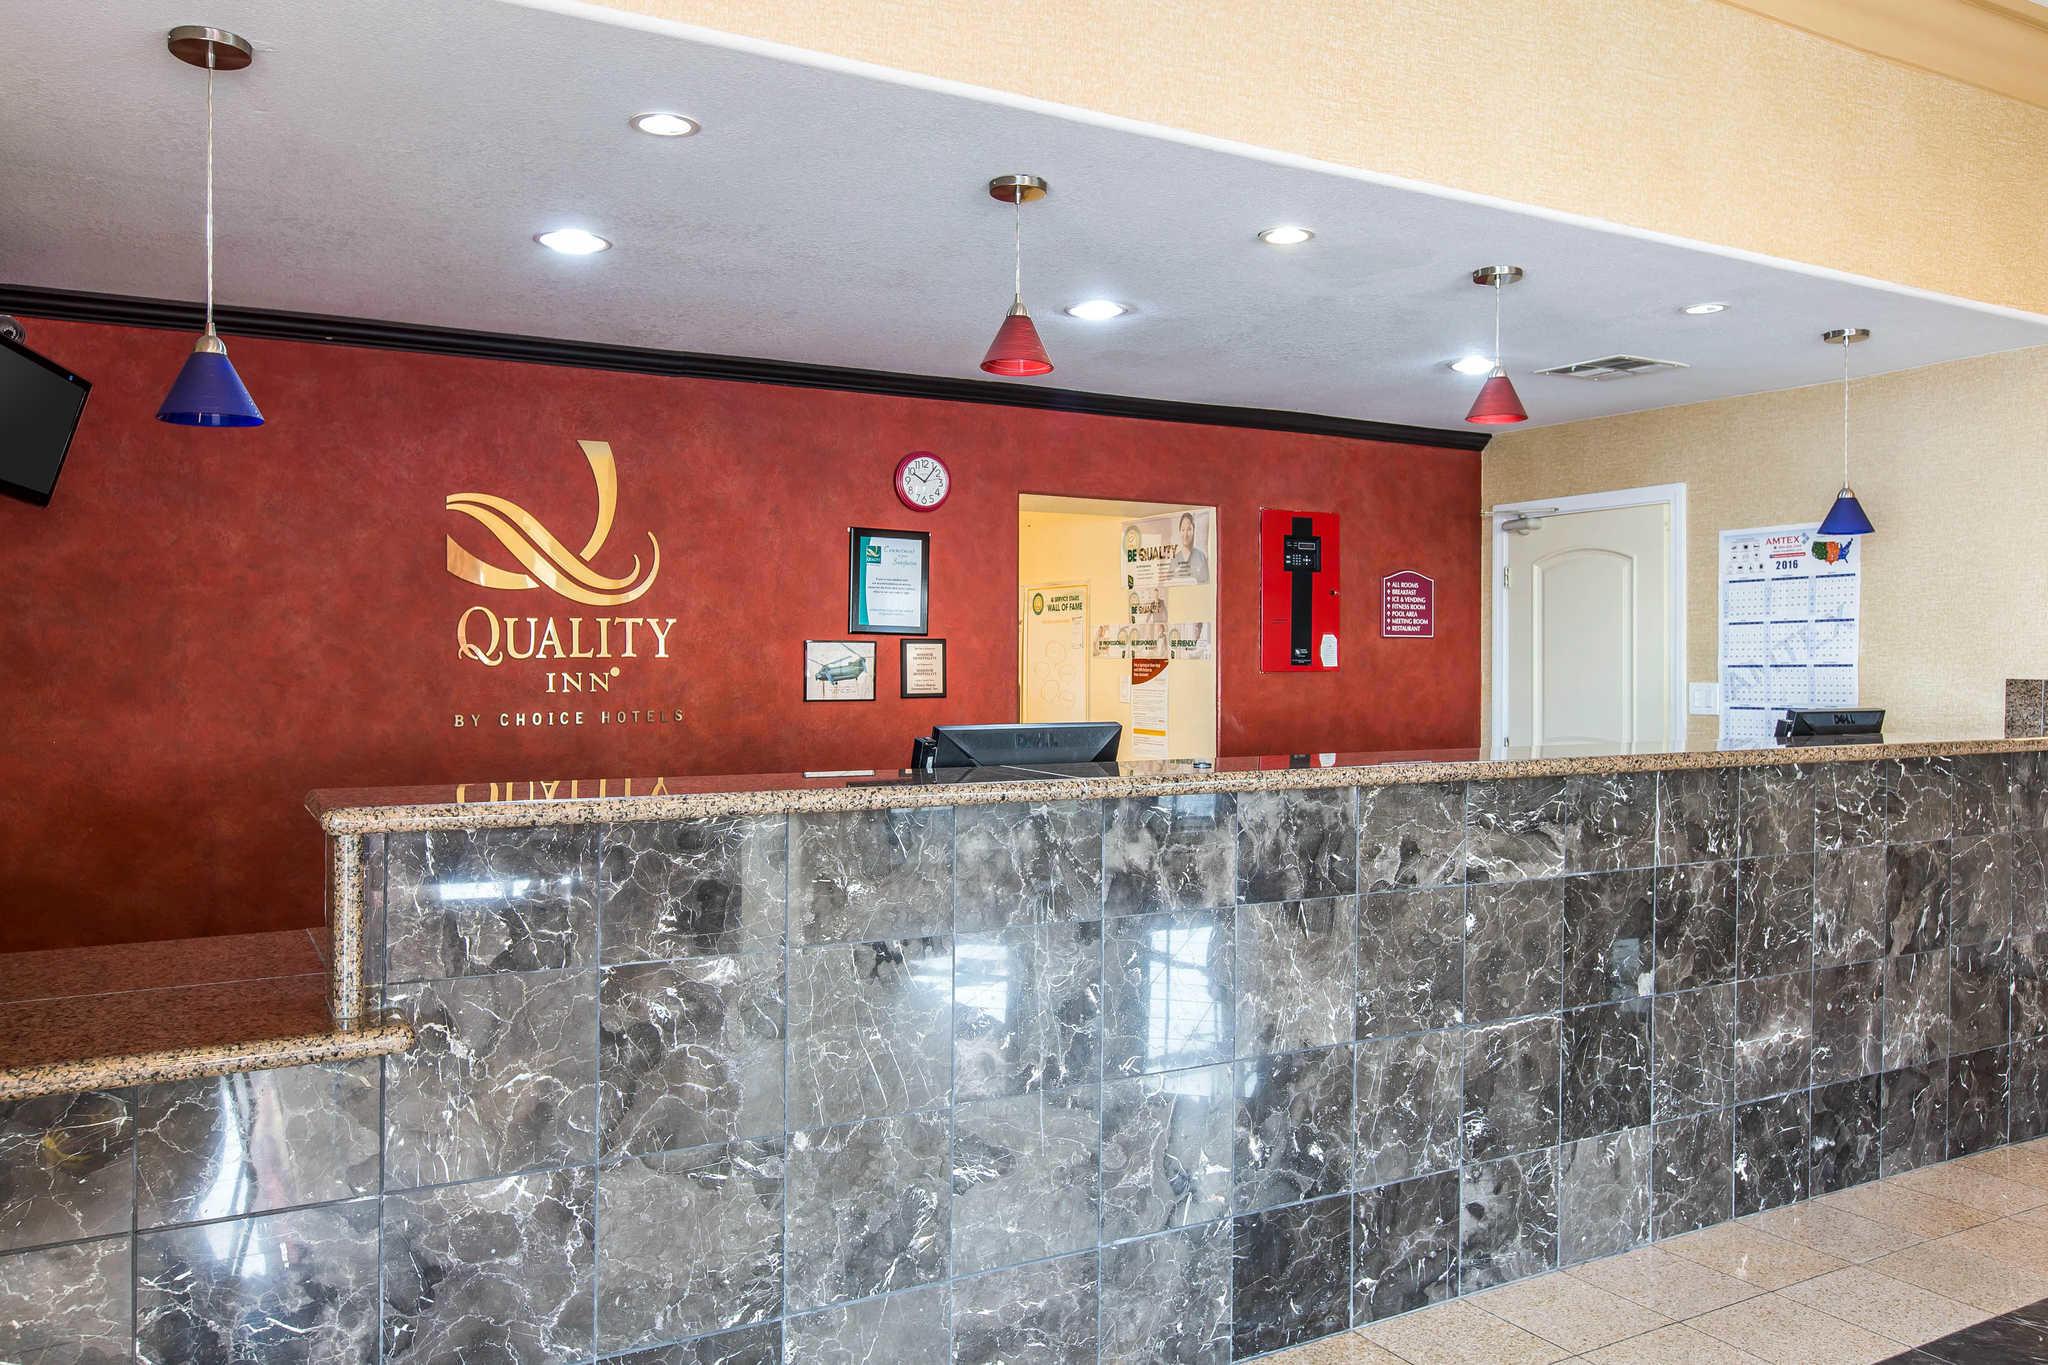 Quality Inn El Centro I-8 image 3